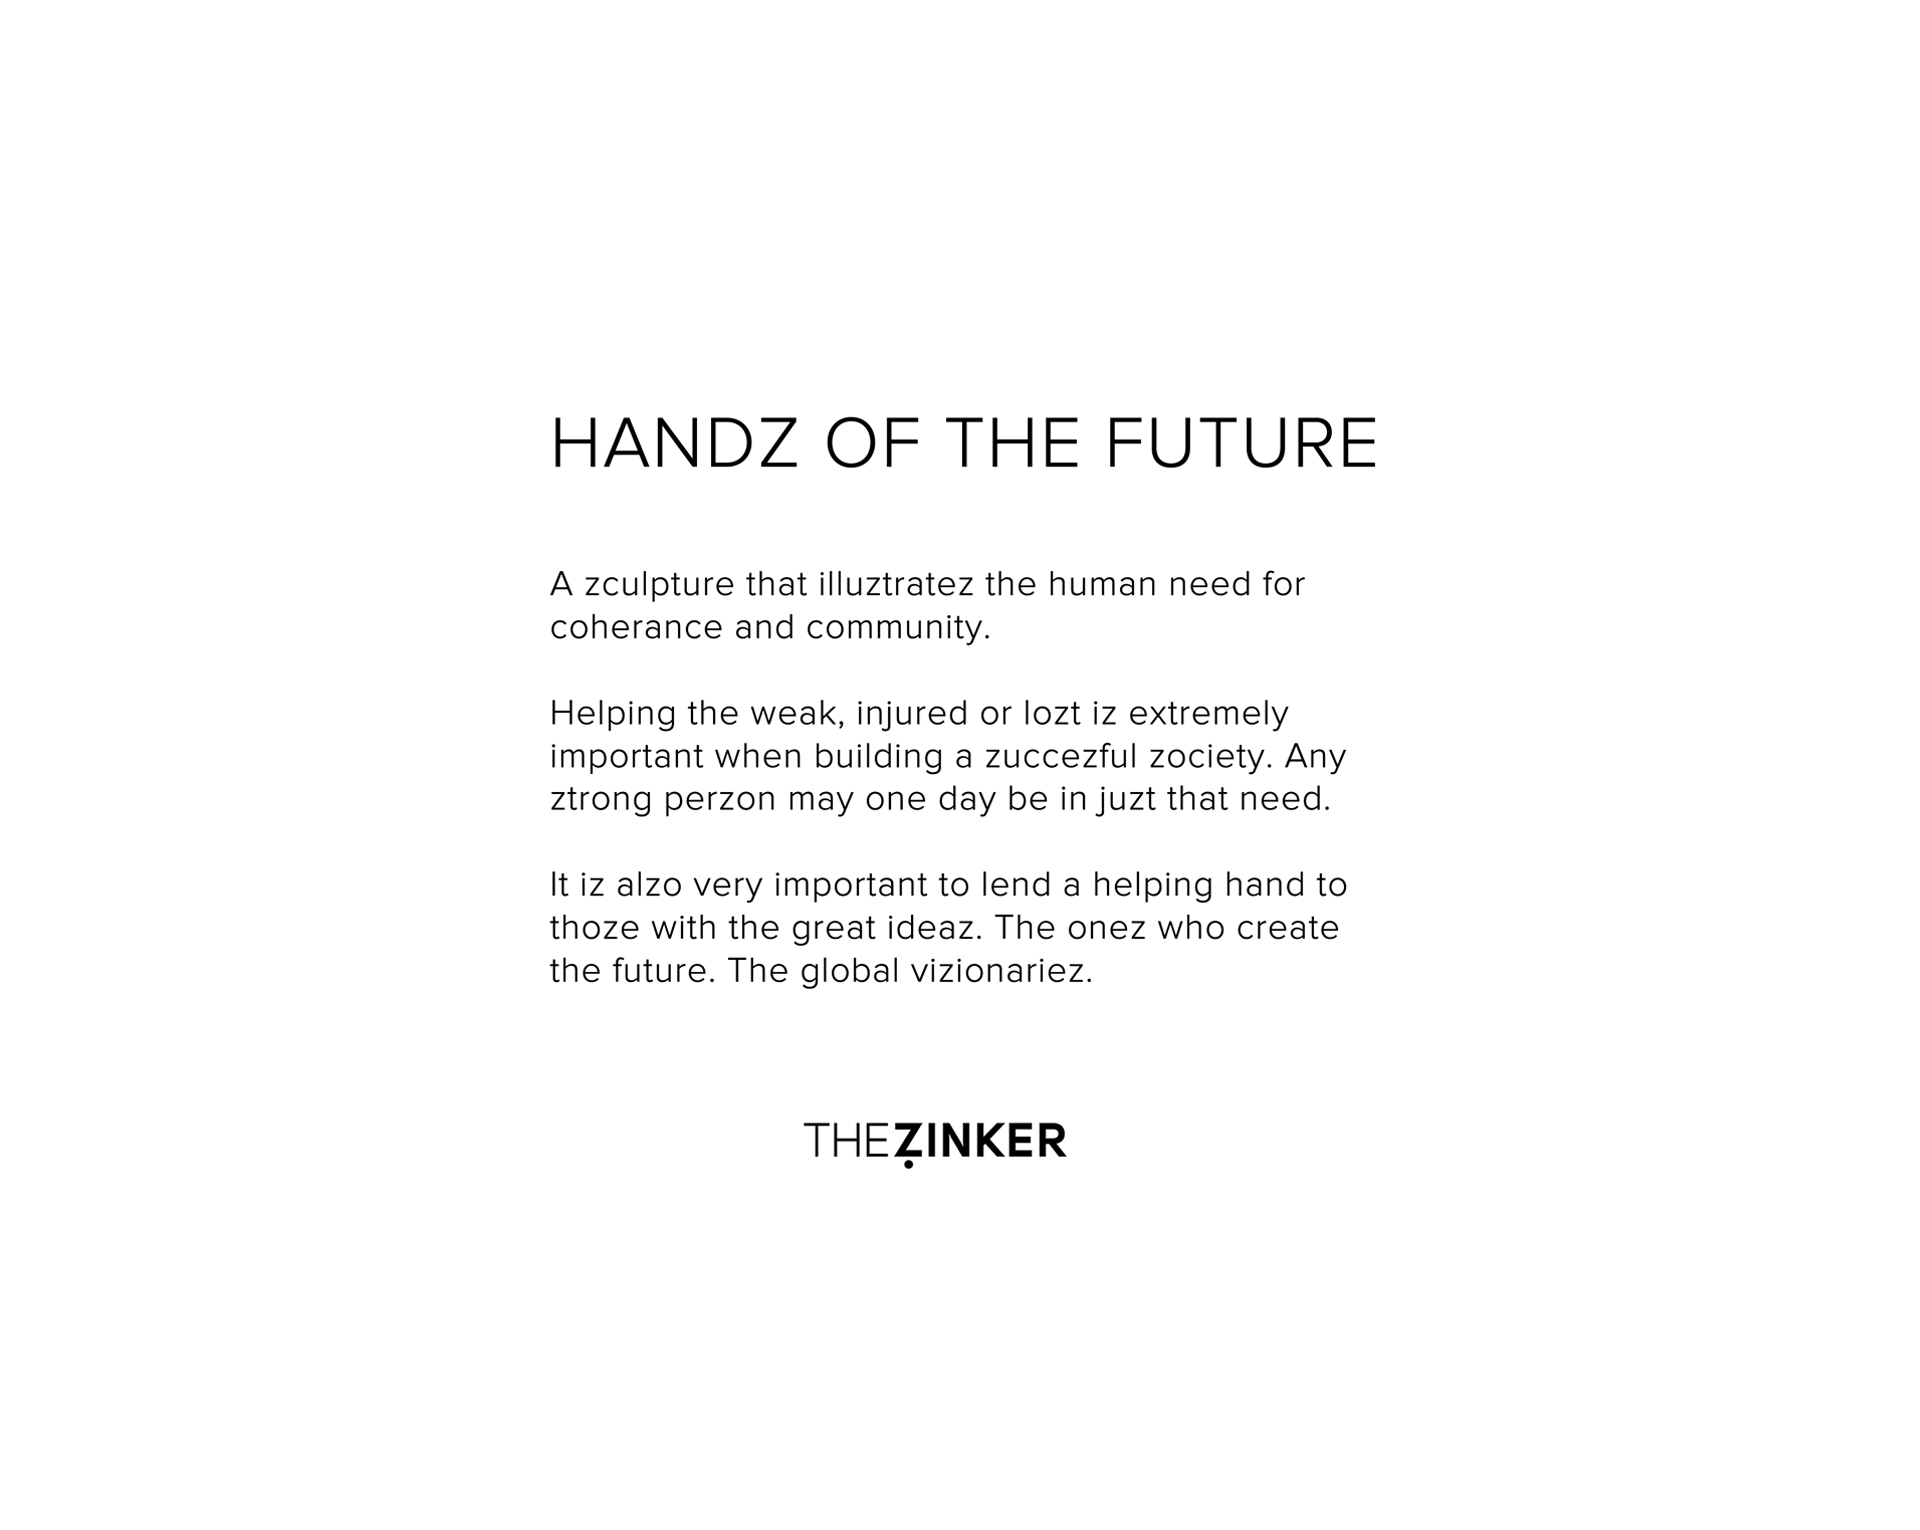 https://thezinker.com/wp-content/uploads/Future-Hands-TEXT.jpg